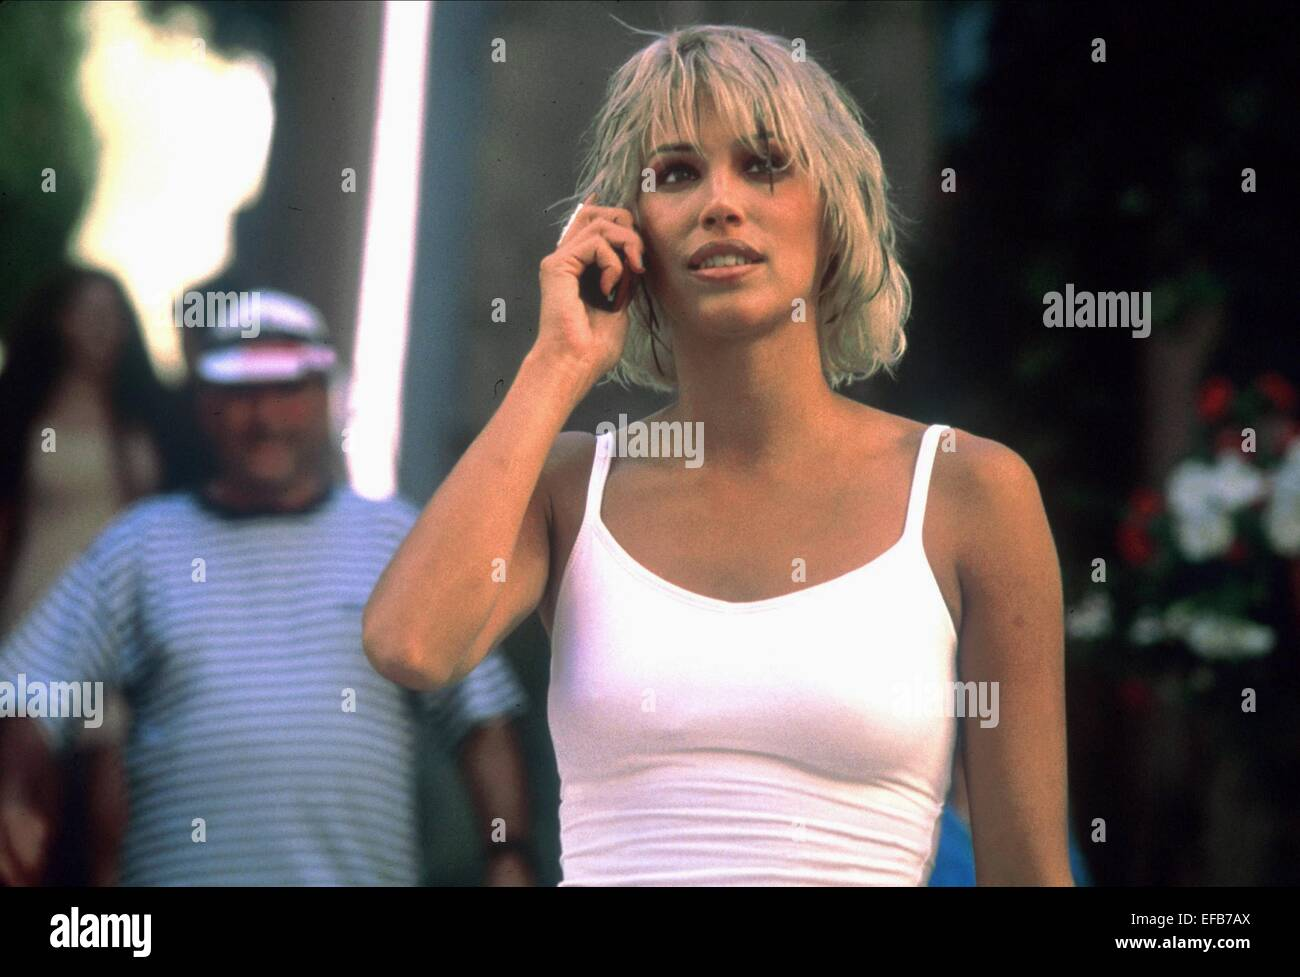 emma wiklund simon sez 1999 stock photo 78308578 alamy